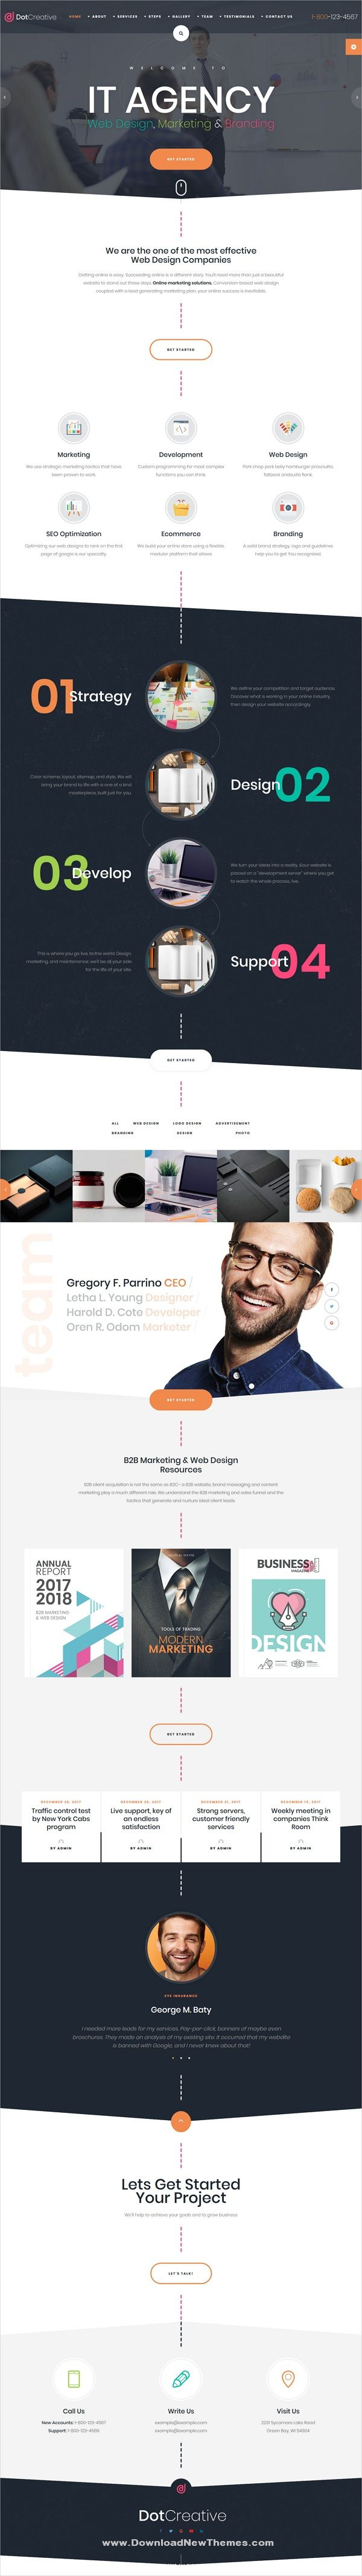 Dotcreative Web Design Agency Html Template